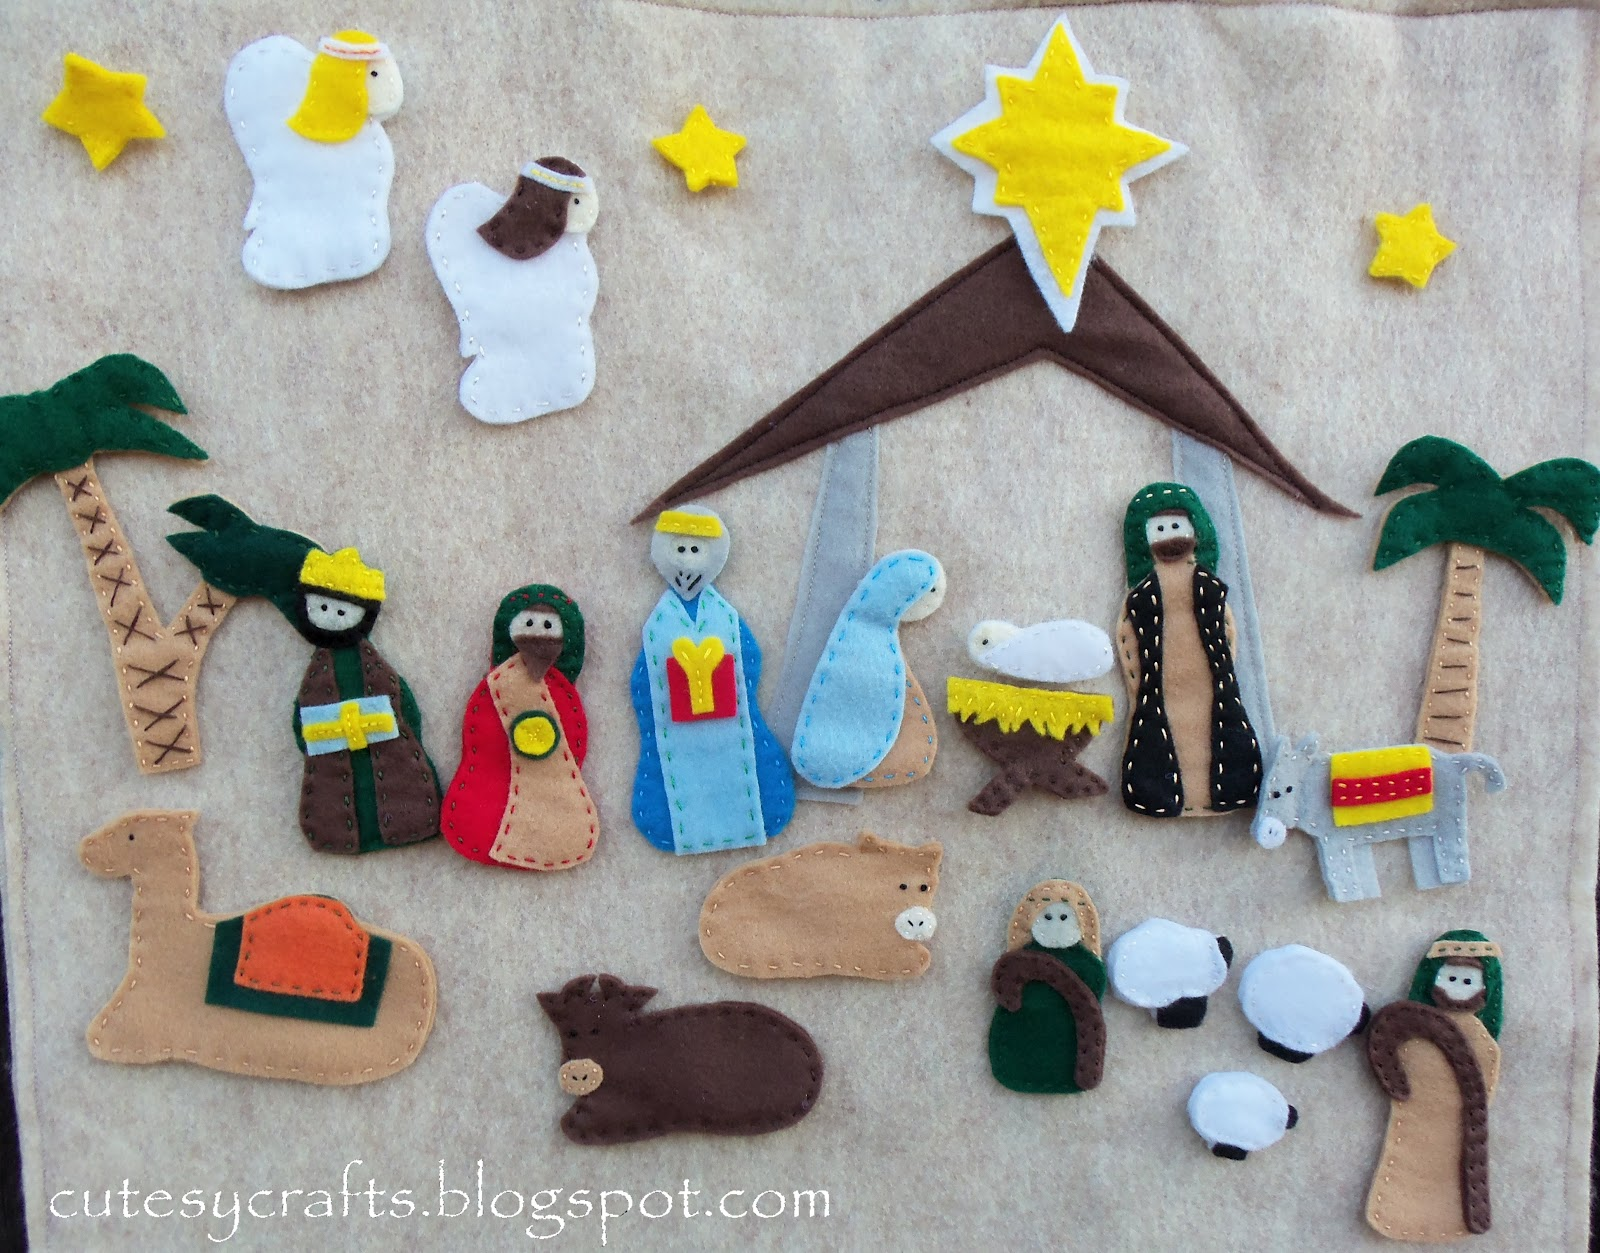 Diy Advent Calendar Nativity : Nativity advent cutesy crafts